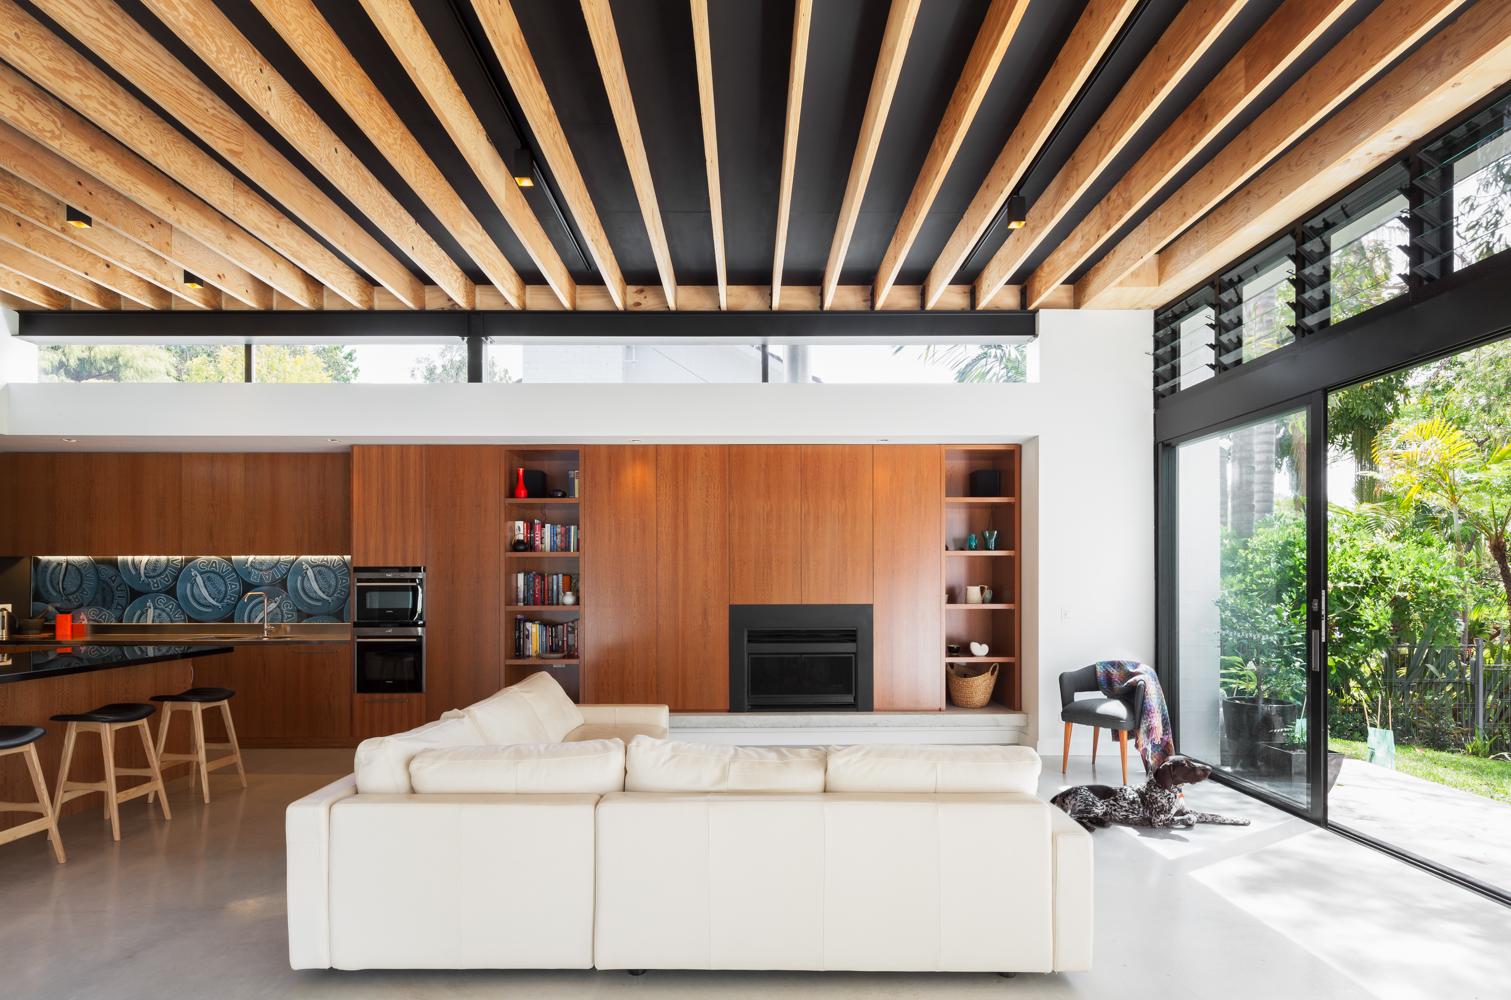 turramurra-house=noxon-giffen-architects-the-design-emotive--5.jpg